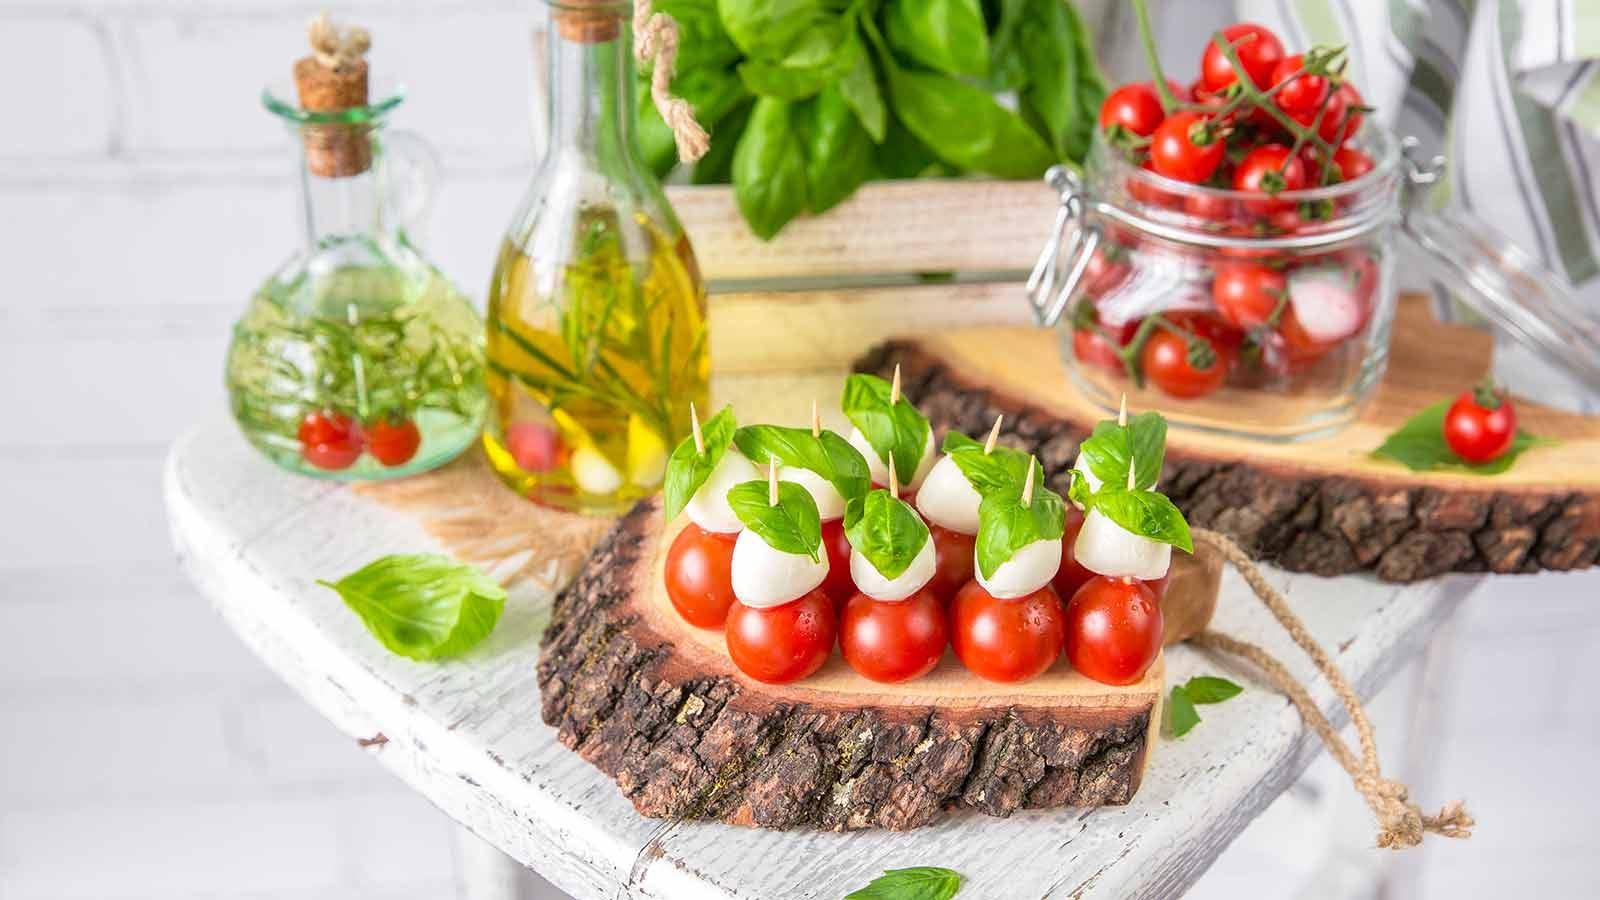 classic Italian caprese canapes made from tomatoes, mozzarella, and basil.